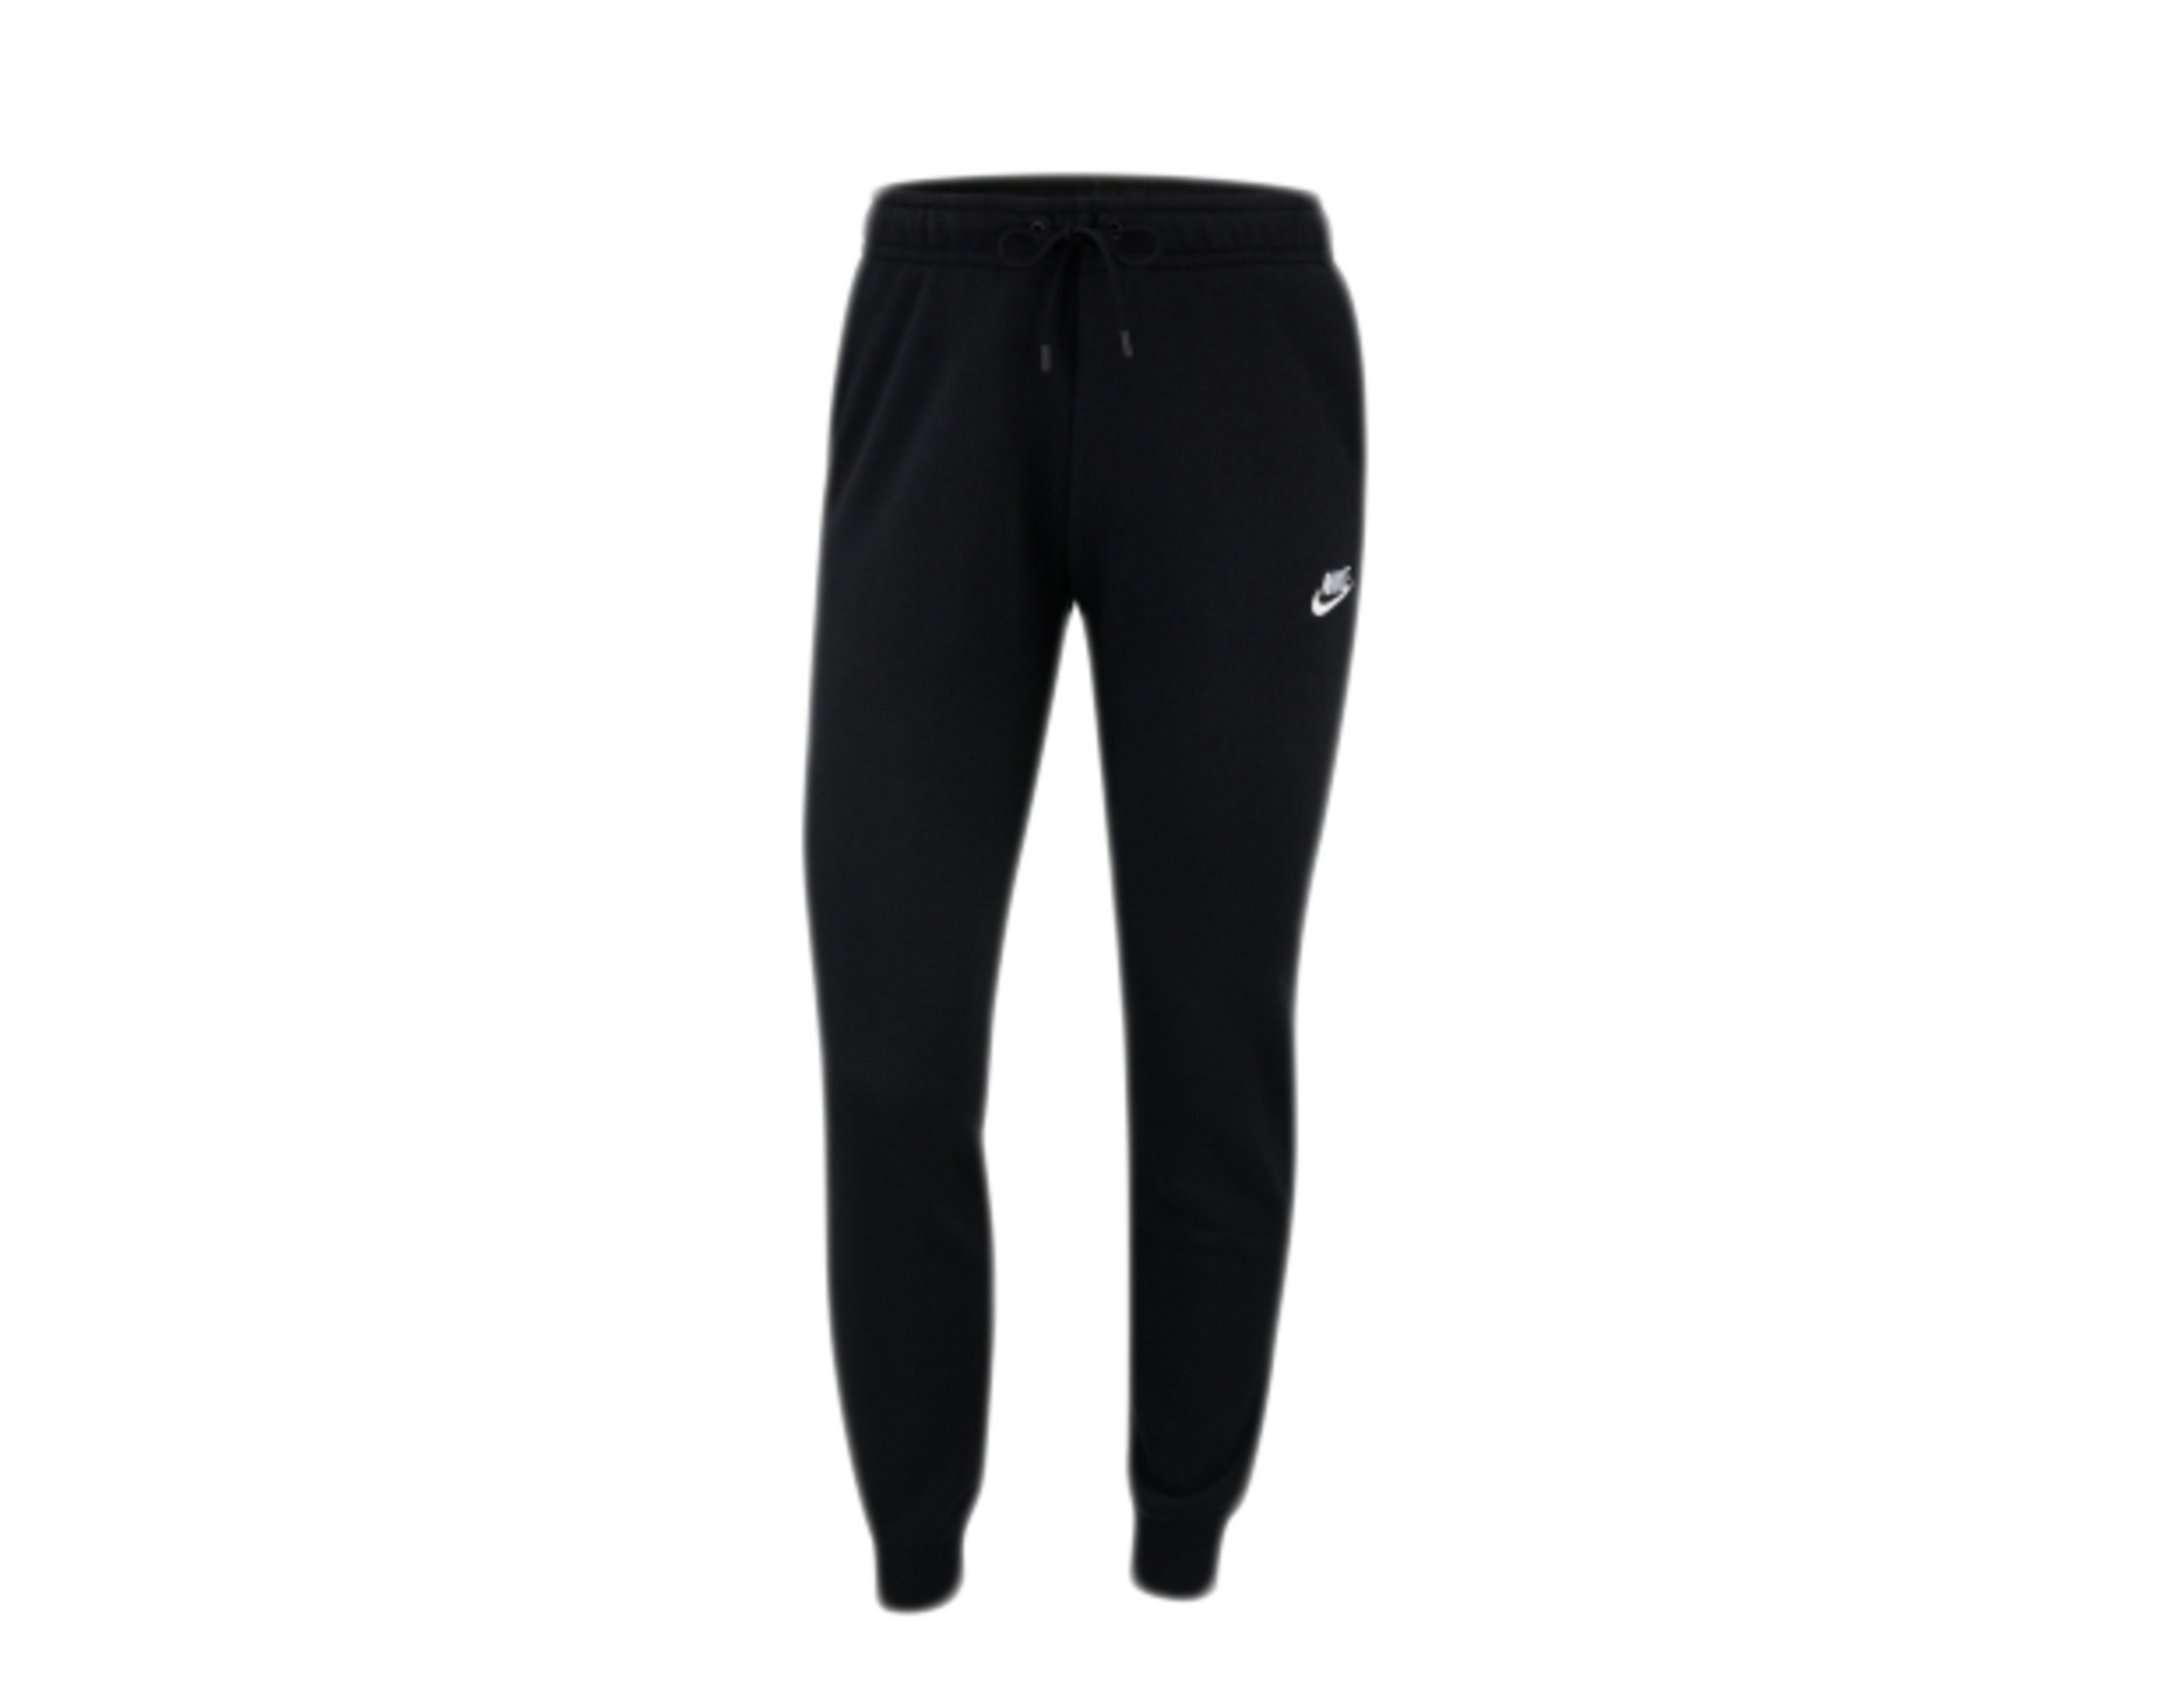 Details about Nike Sportswear Essential Fleece Black/White Women's Pants  BV4095-010 X-Large